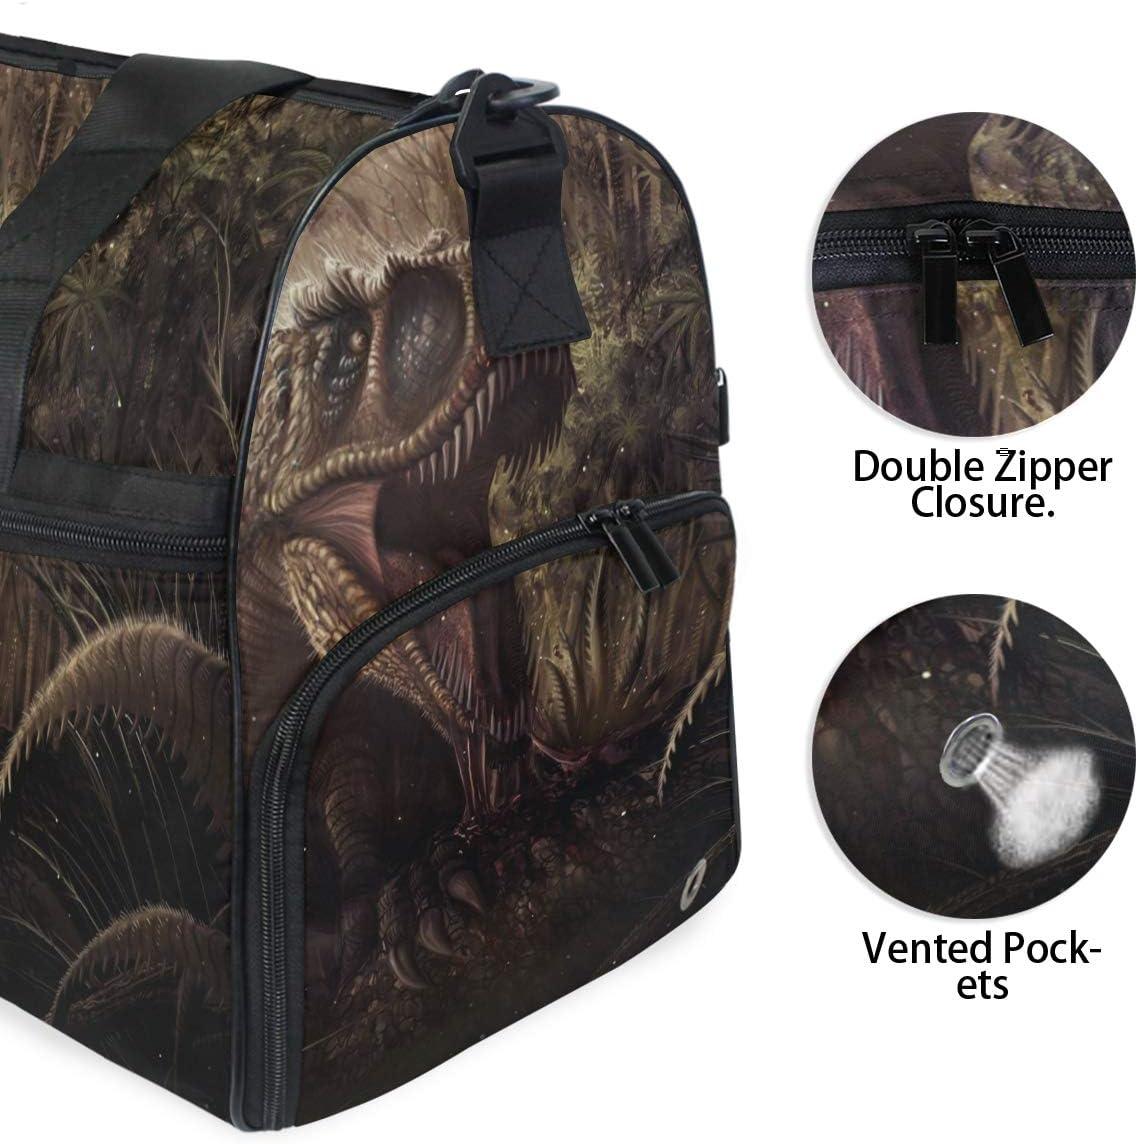 FANTAZIO Ancient Age Danger Animal Dinosaur Sports Duffle Bag Gym Bag Travel Duffel with Adjustable Strap